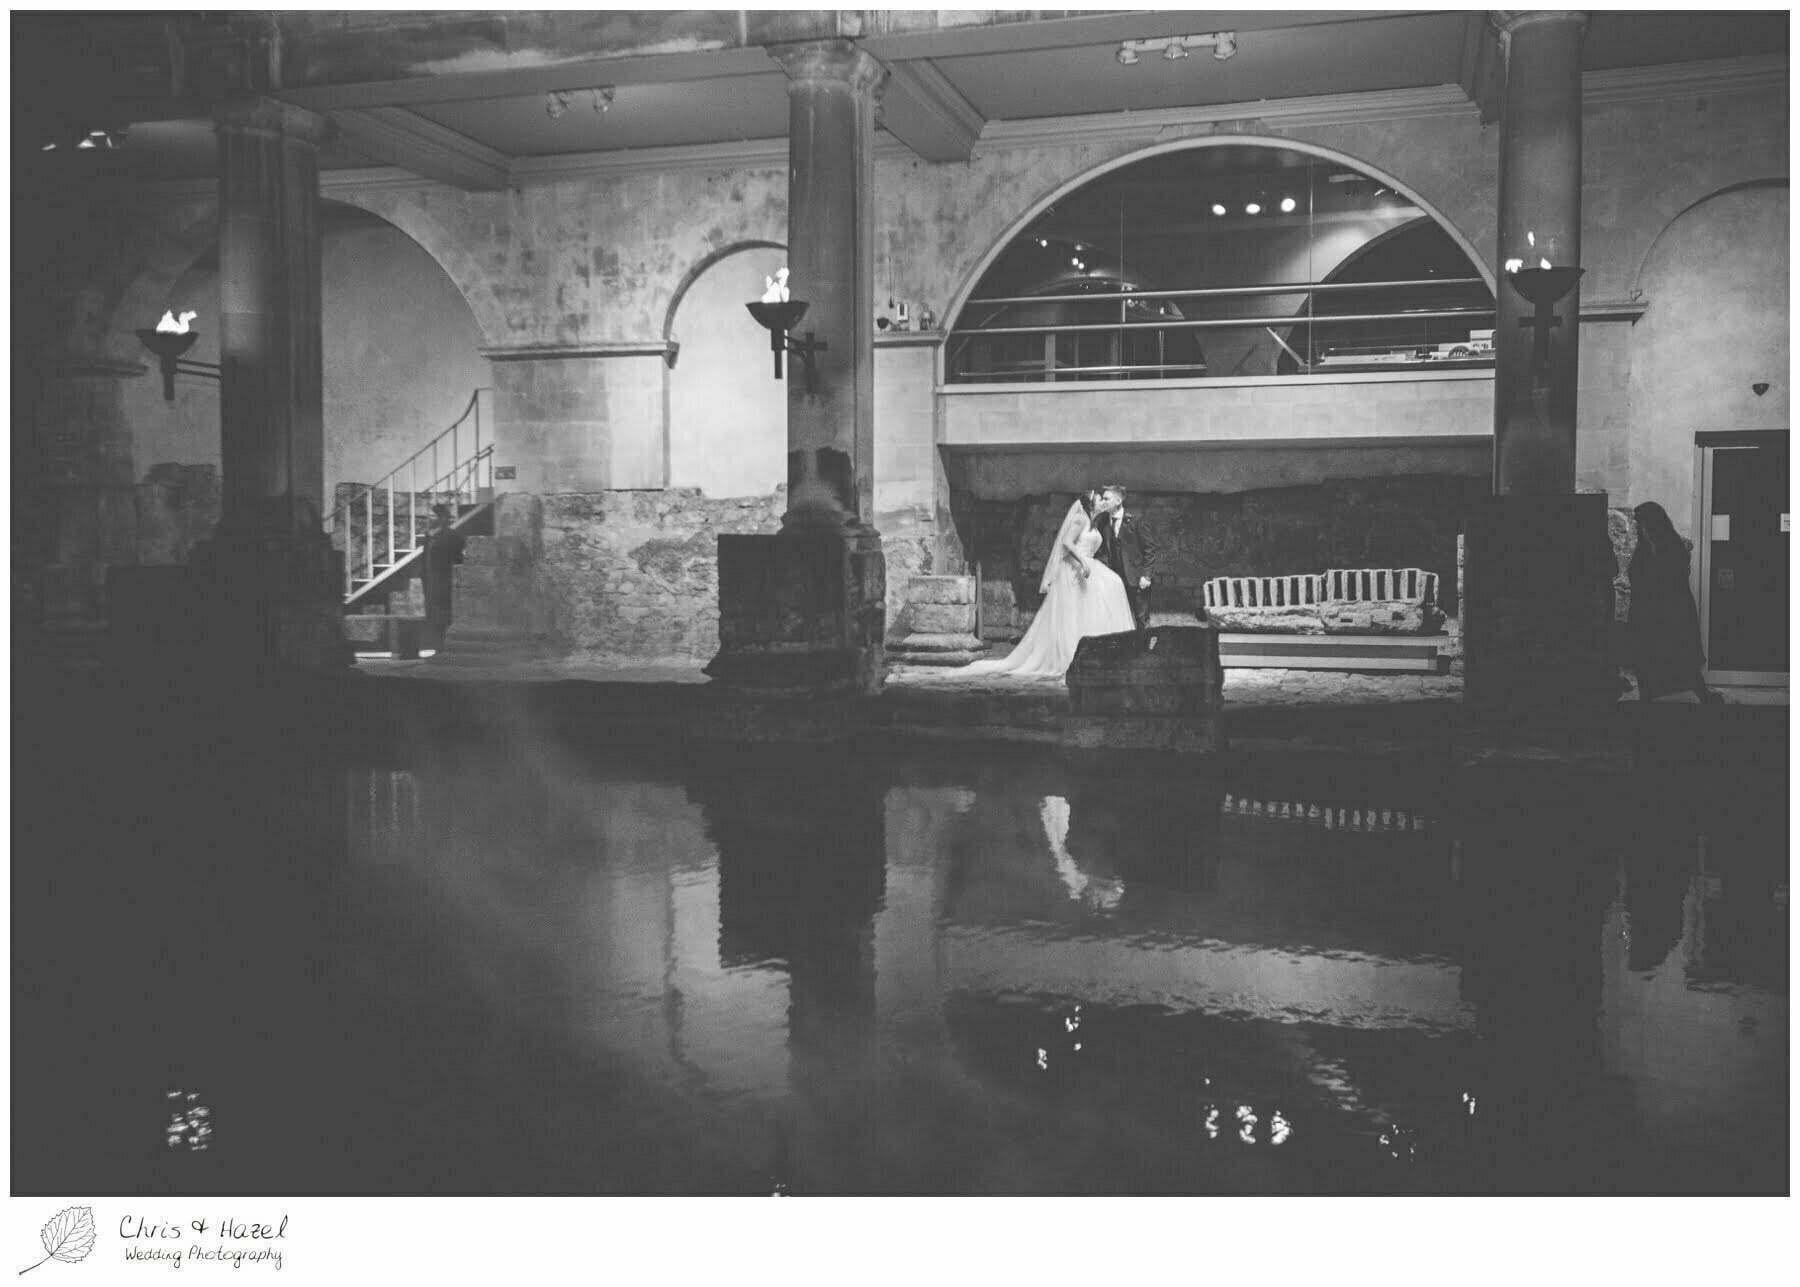 Bridal portraits, Bride and Groom at Roman Baths Pump Rooms, The Roman Baths Wedding Photography, Roman Baths Wedding Photographer, Wedding in Bath, Bath Wedding Day, documentary wedding photography, Chris and Hazel Wedding Photography Bath, Sammie Singfield Scott Brown